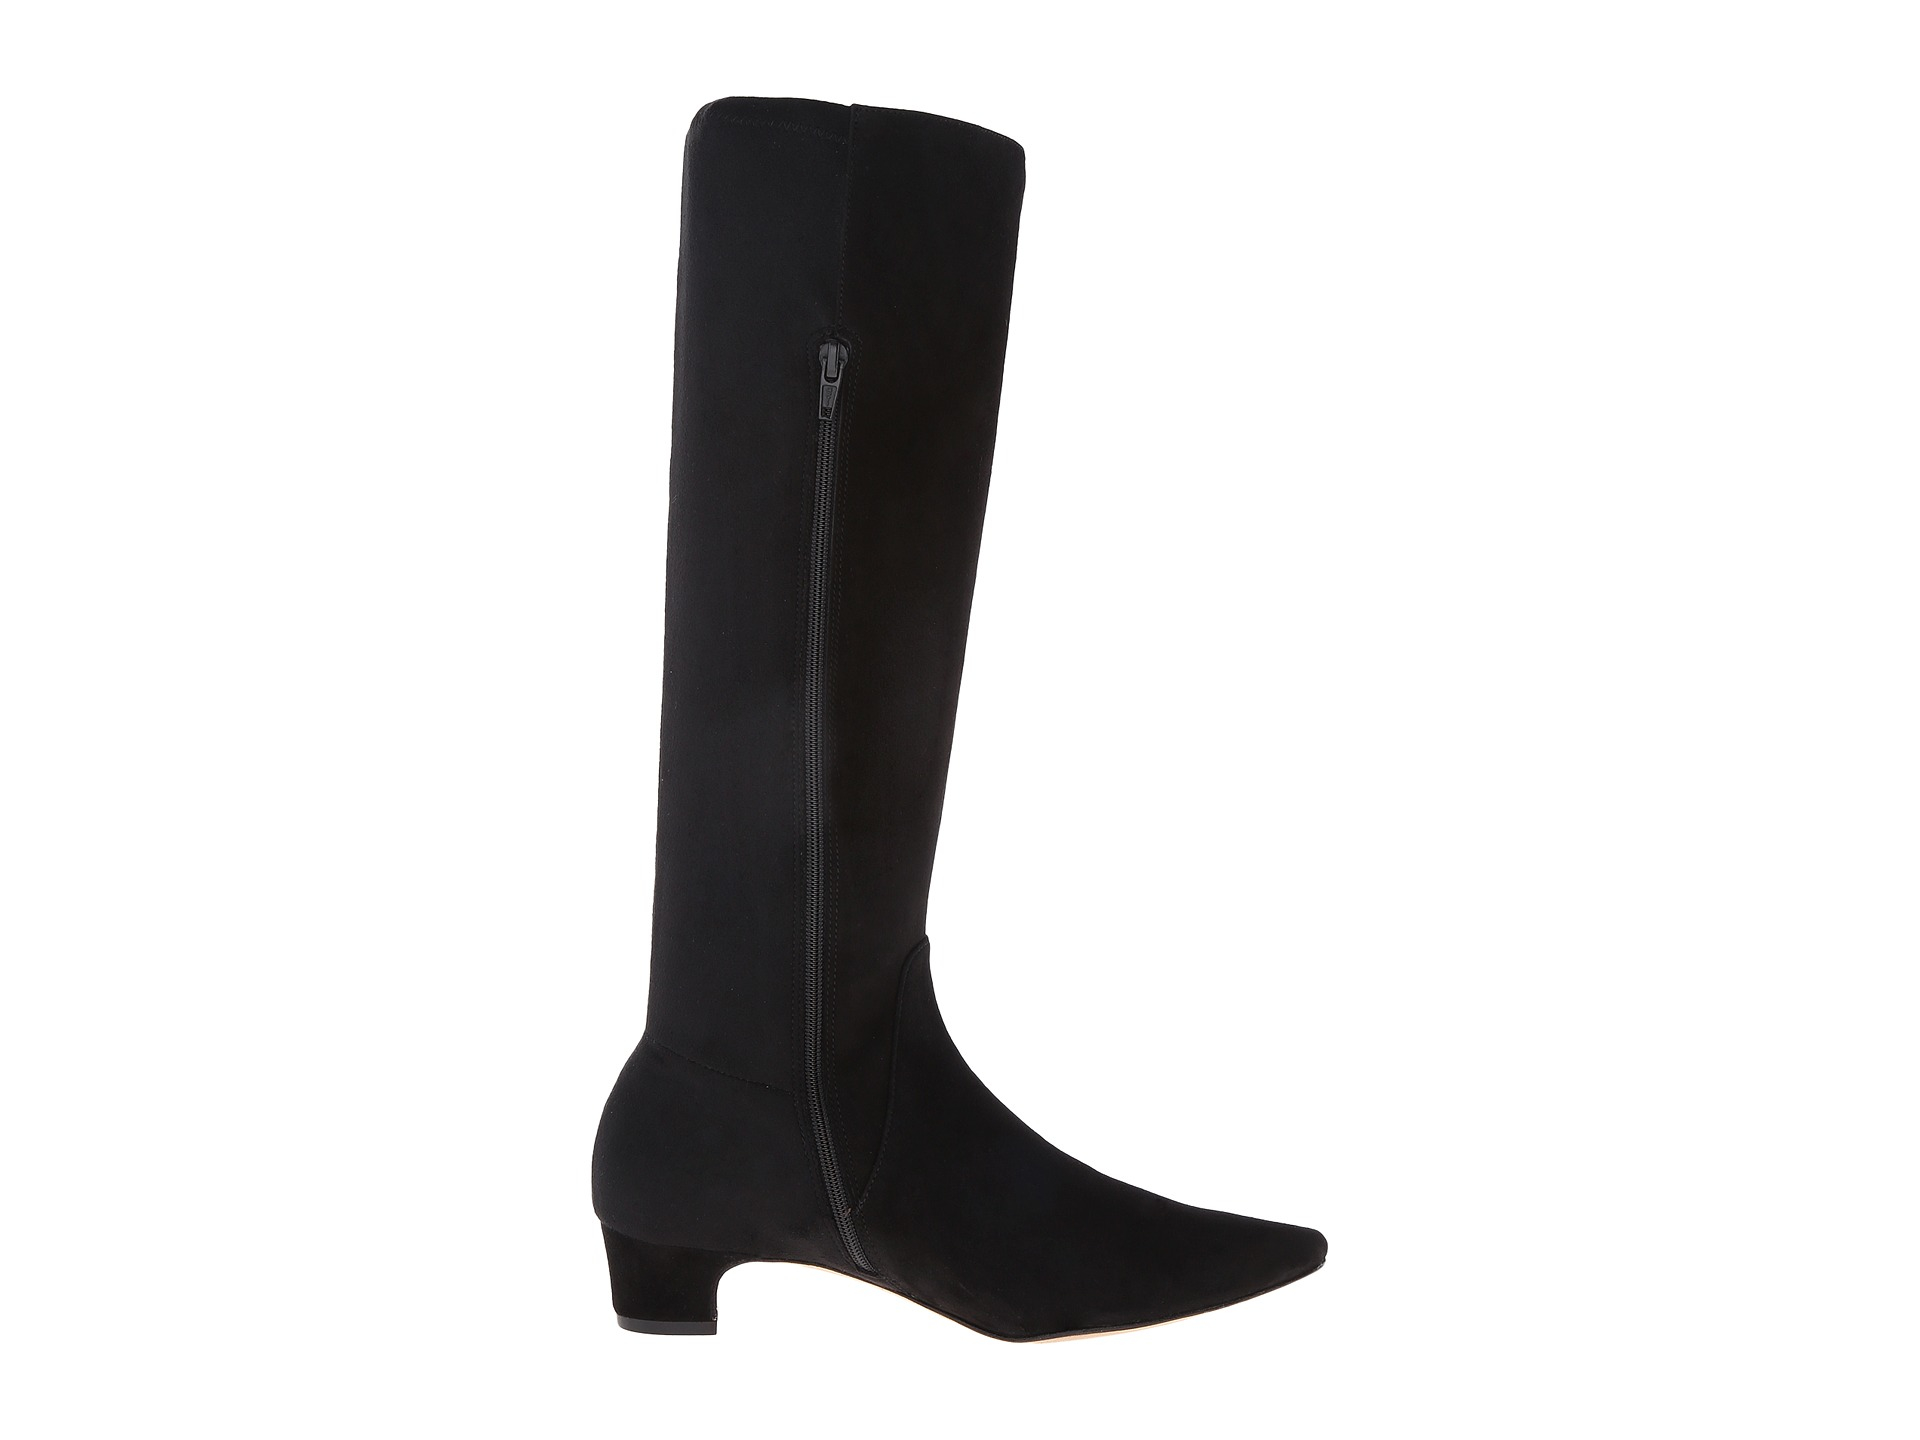 vaneli suede boots on sale 6b813 fc9d3